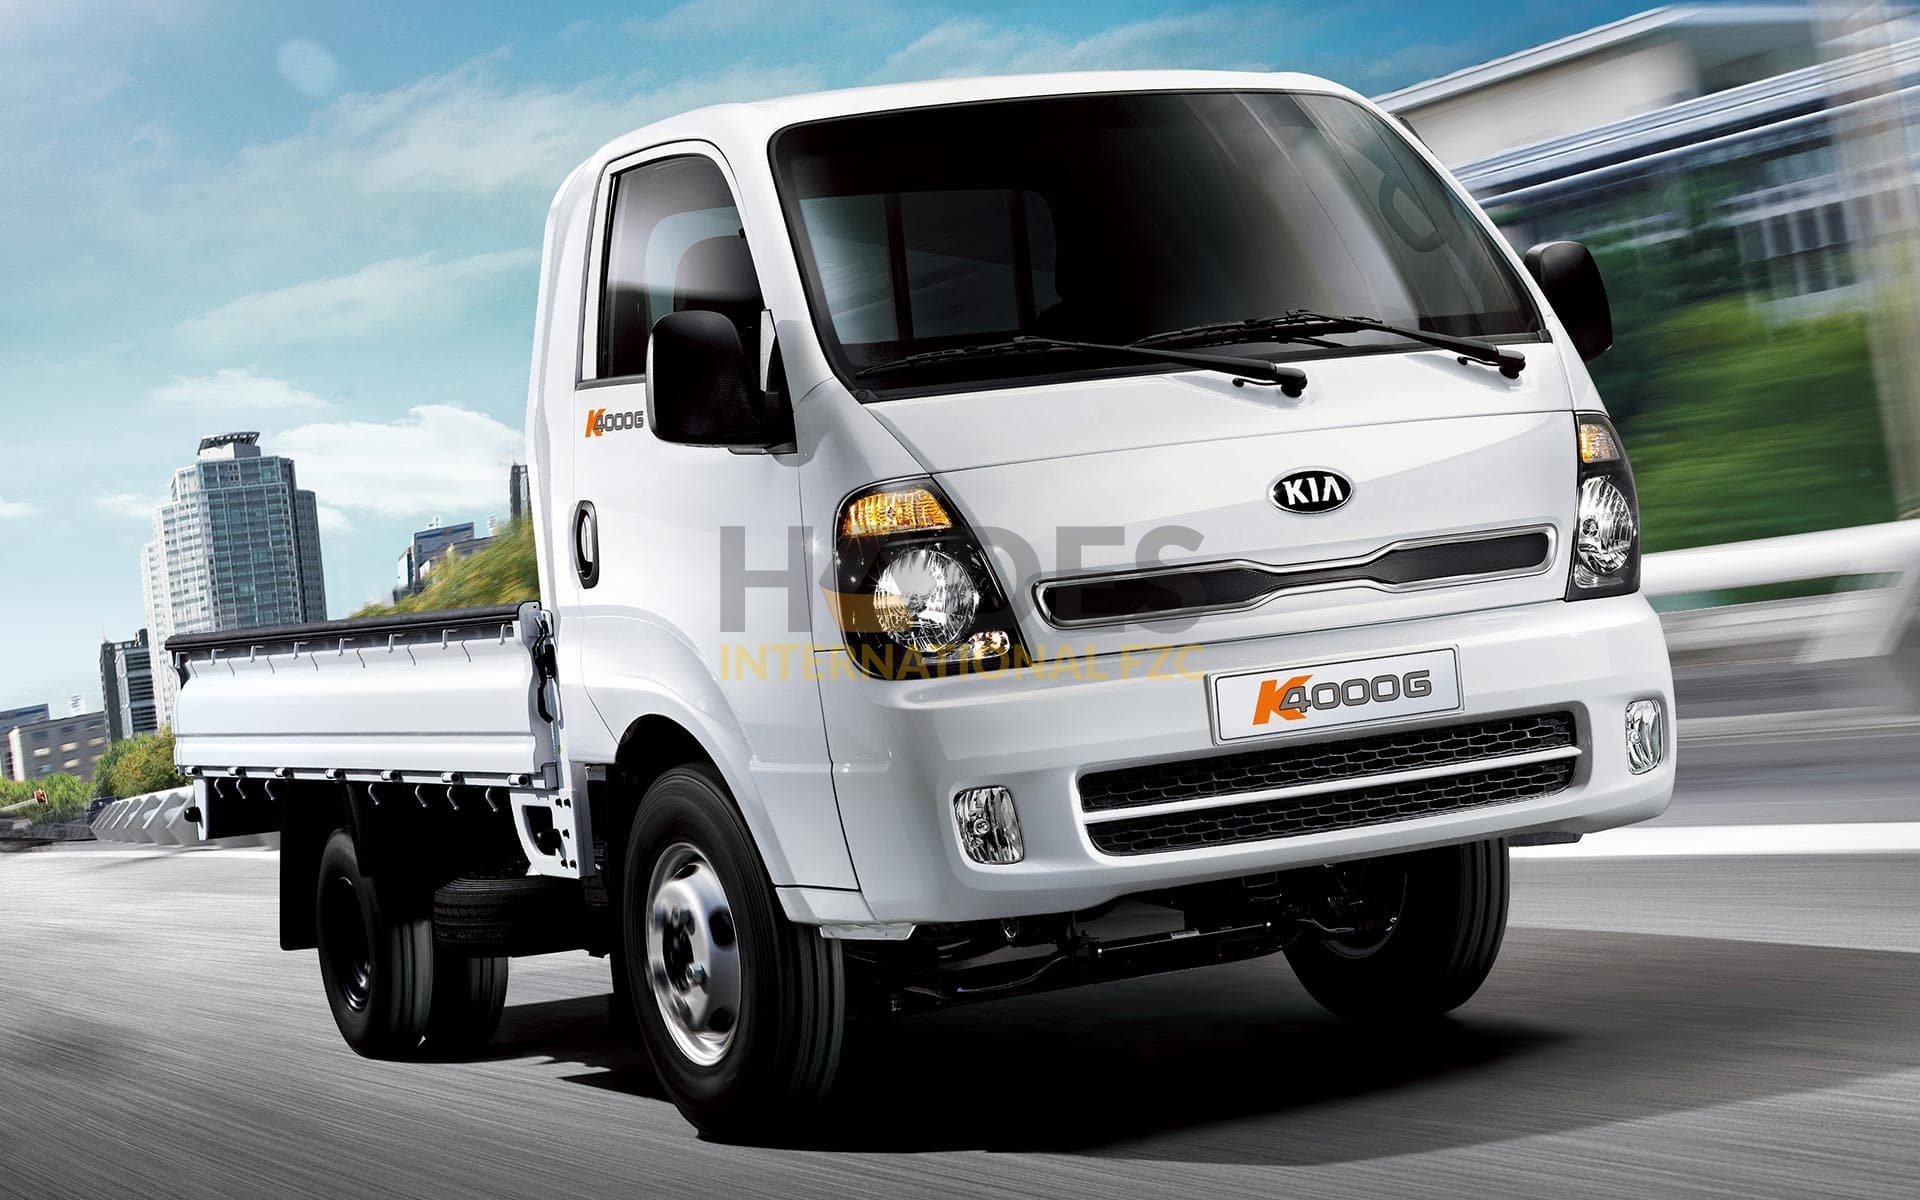 Kia K4000 3.0L 2WD Diesel Truck  2020 model